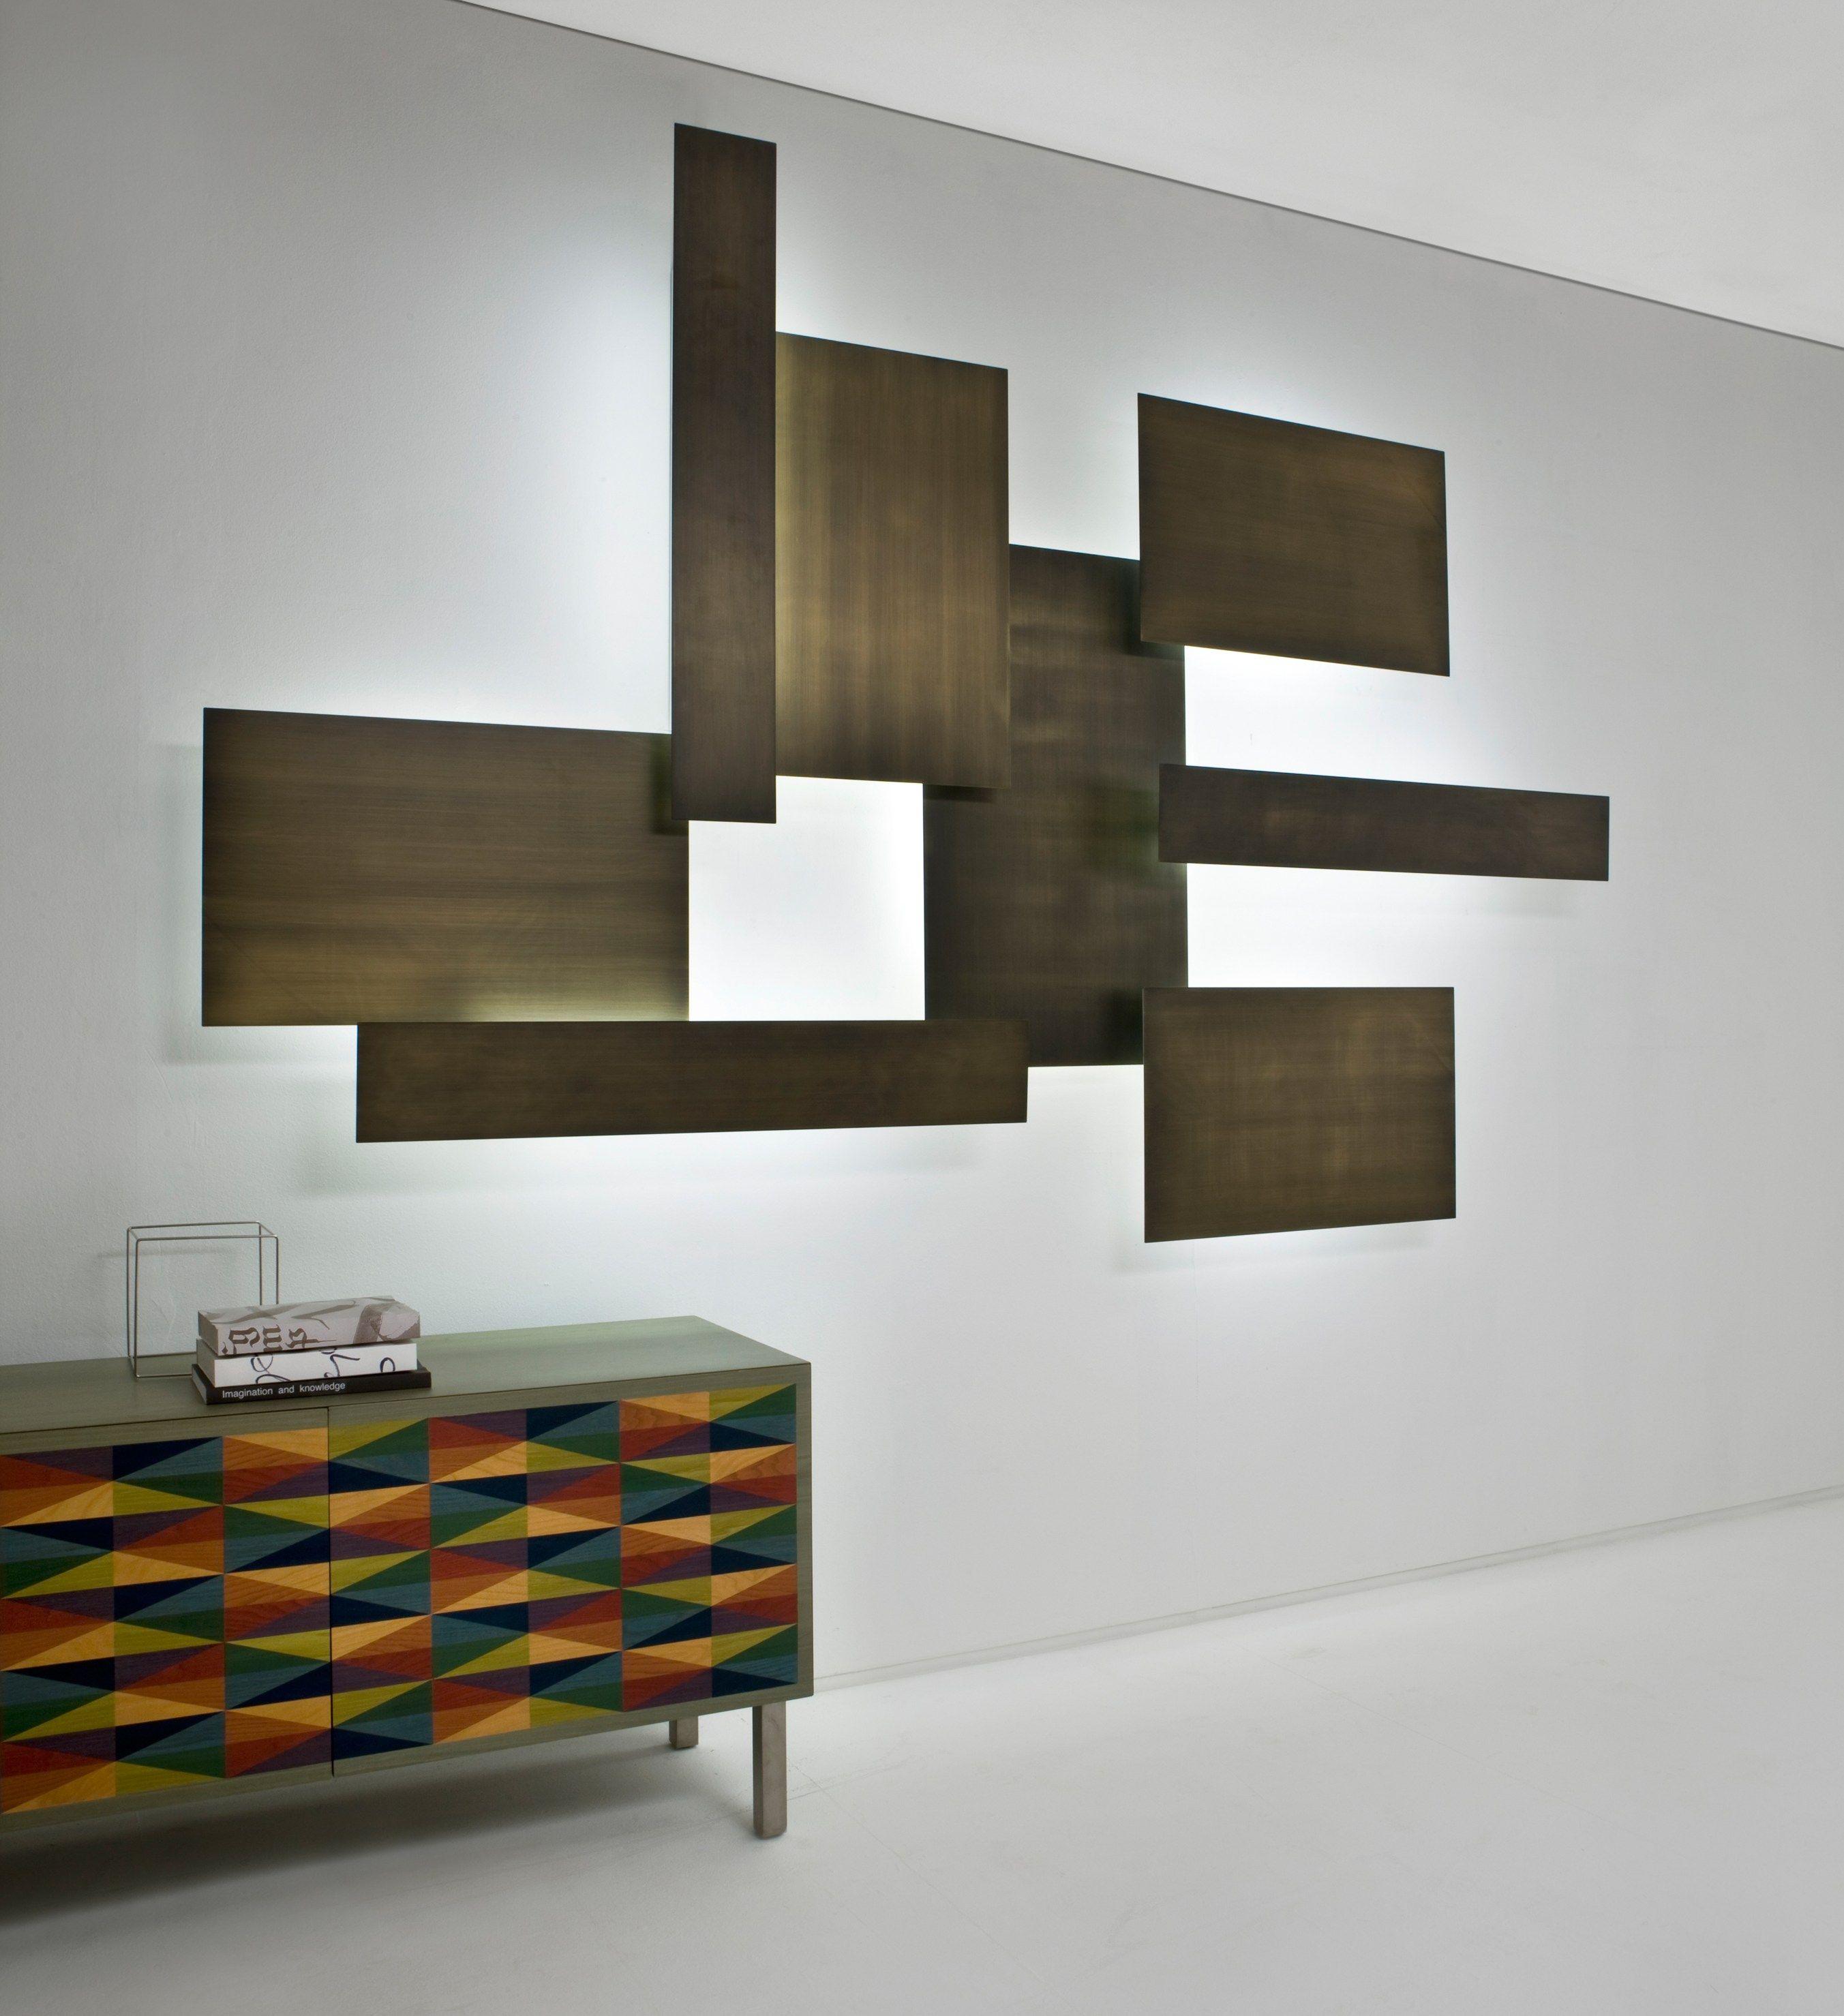 Lampada da parete in ottone lightwall by laurameroni - Lampada da parete design ...